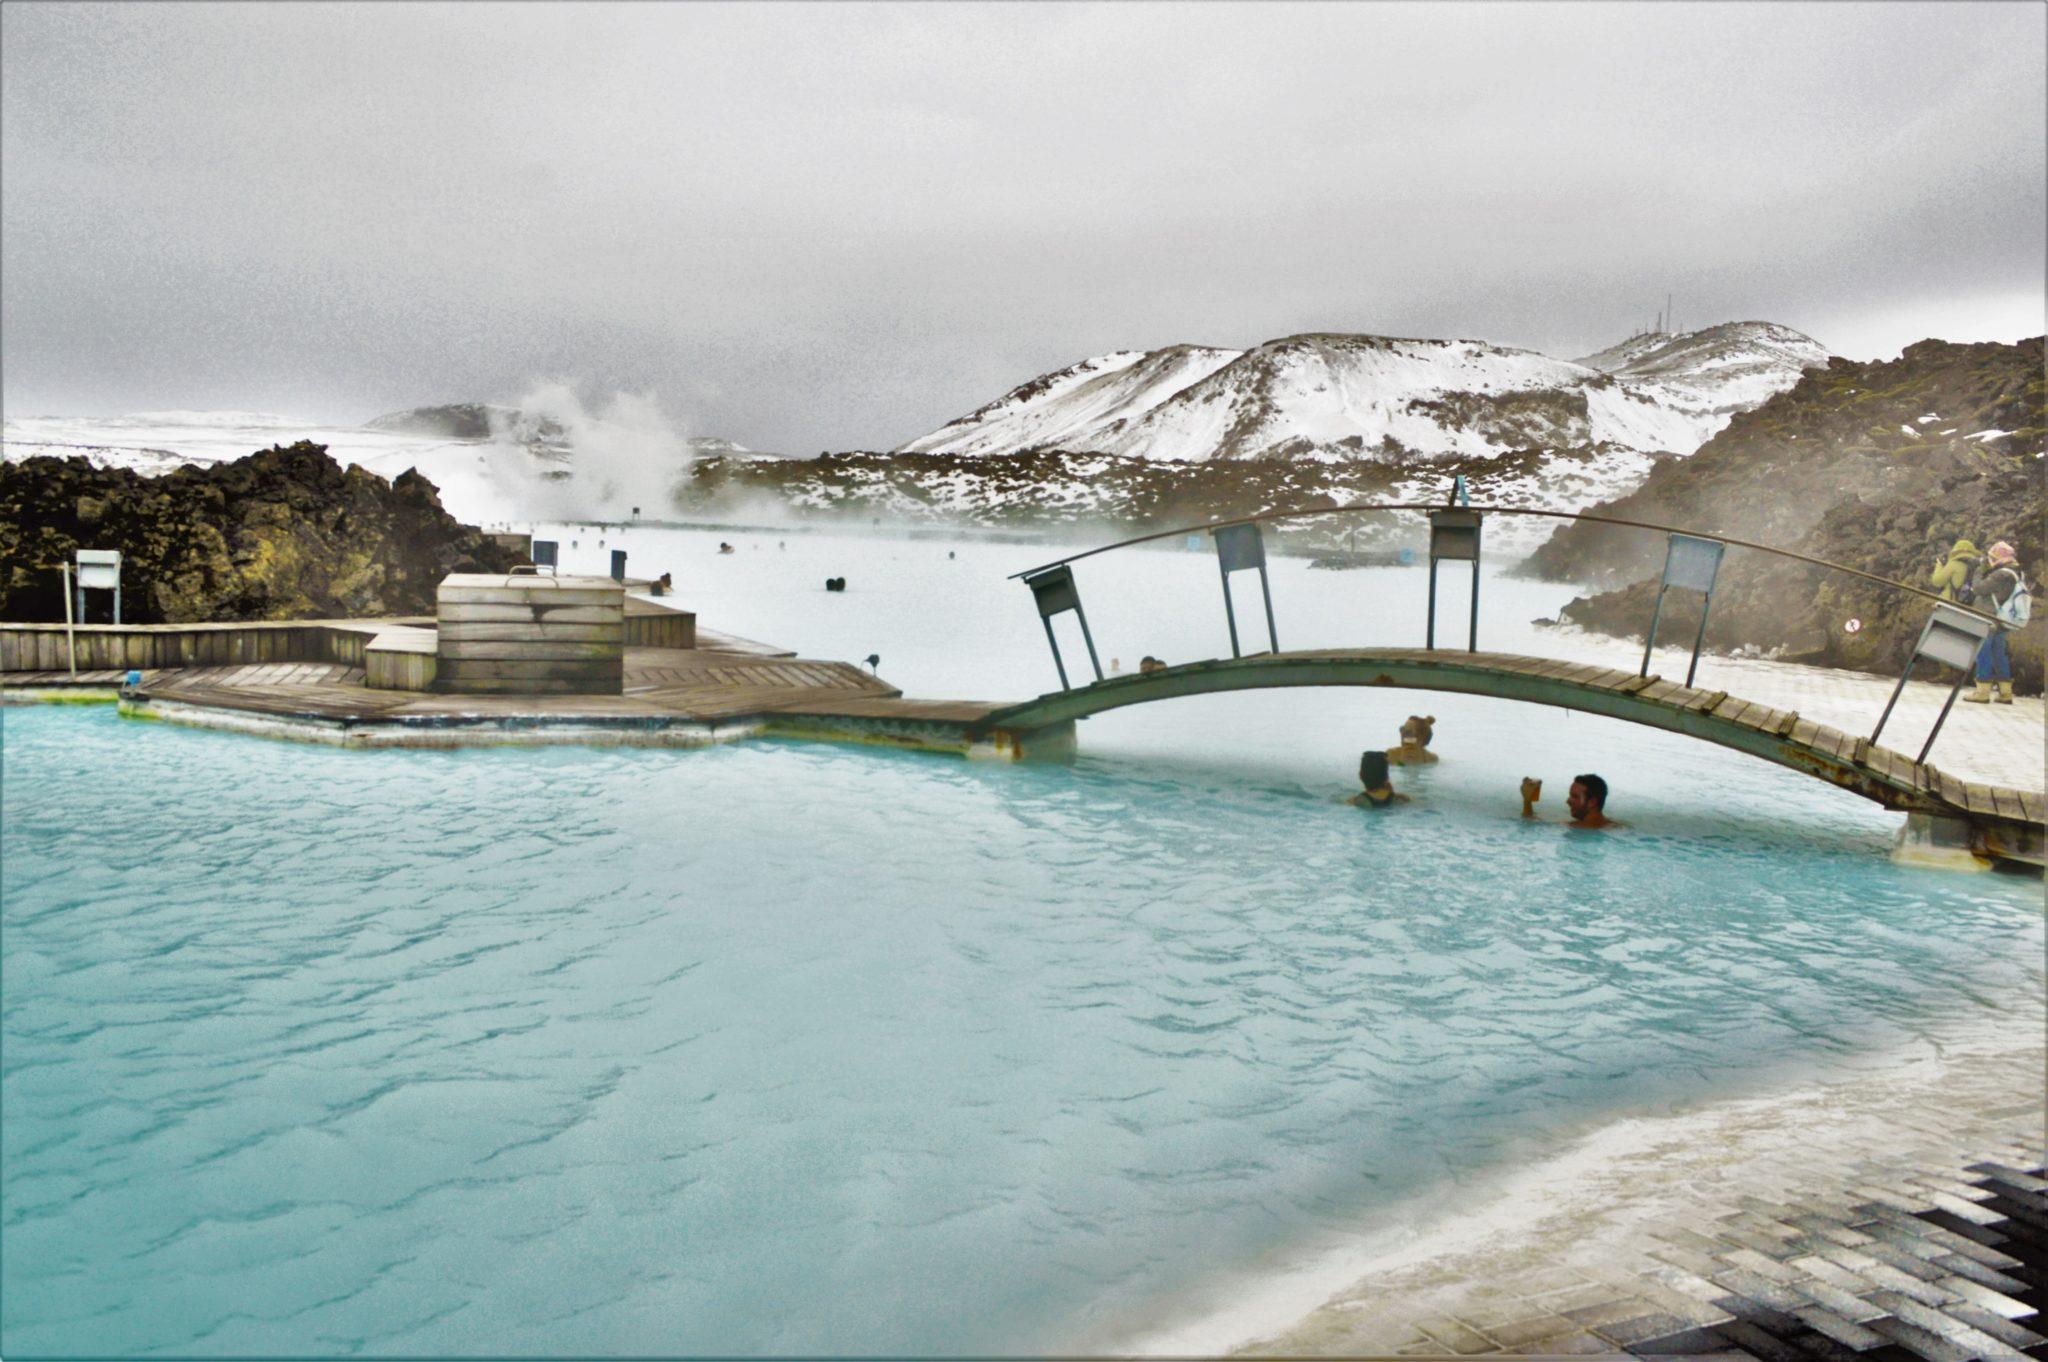 The Blue Lagoon, Iceland, Europe